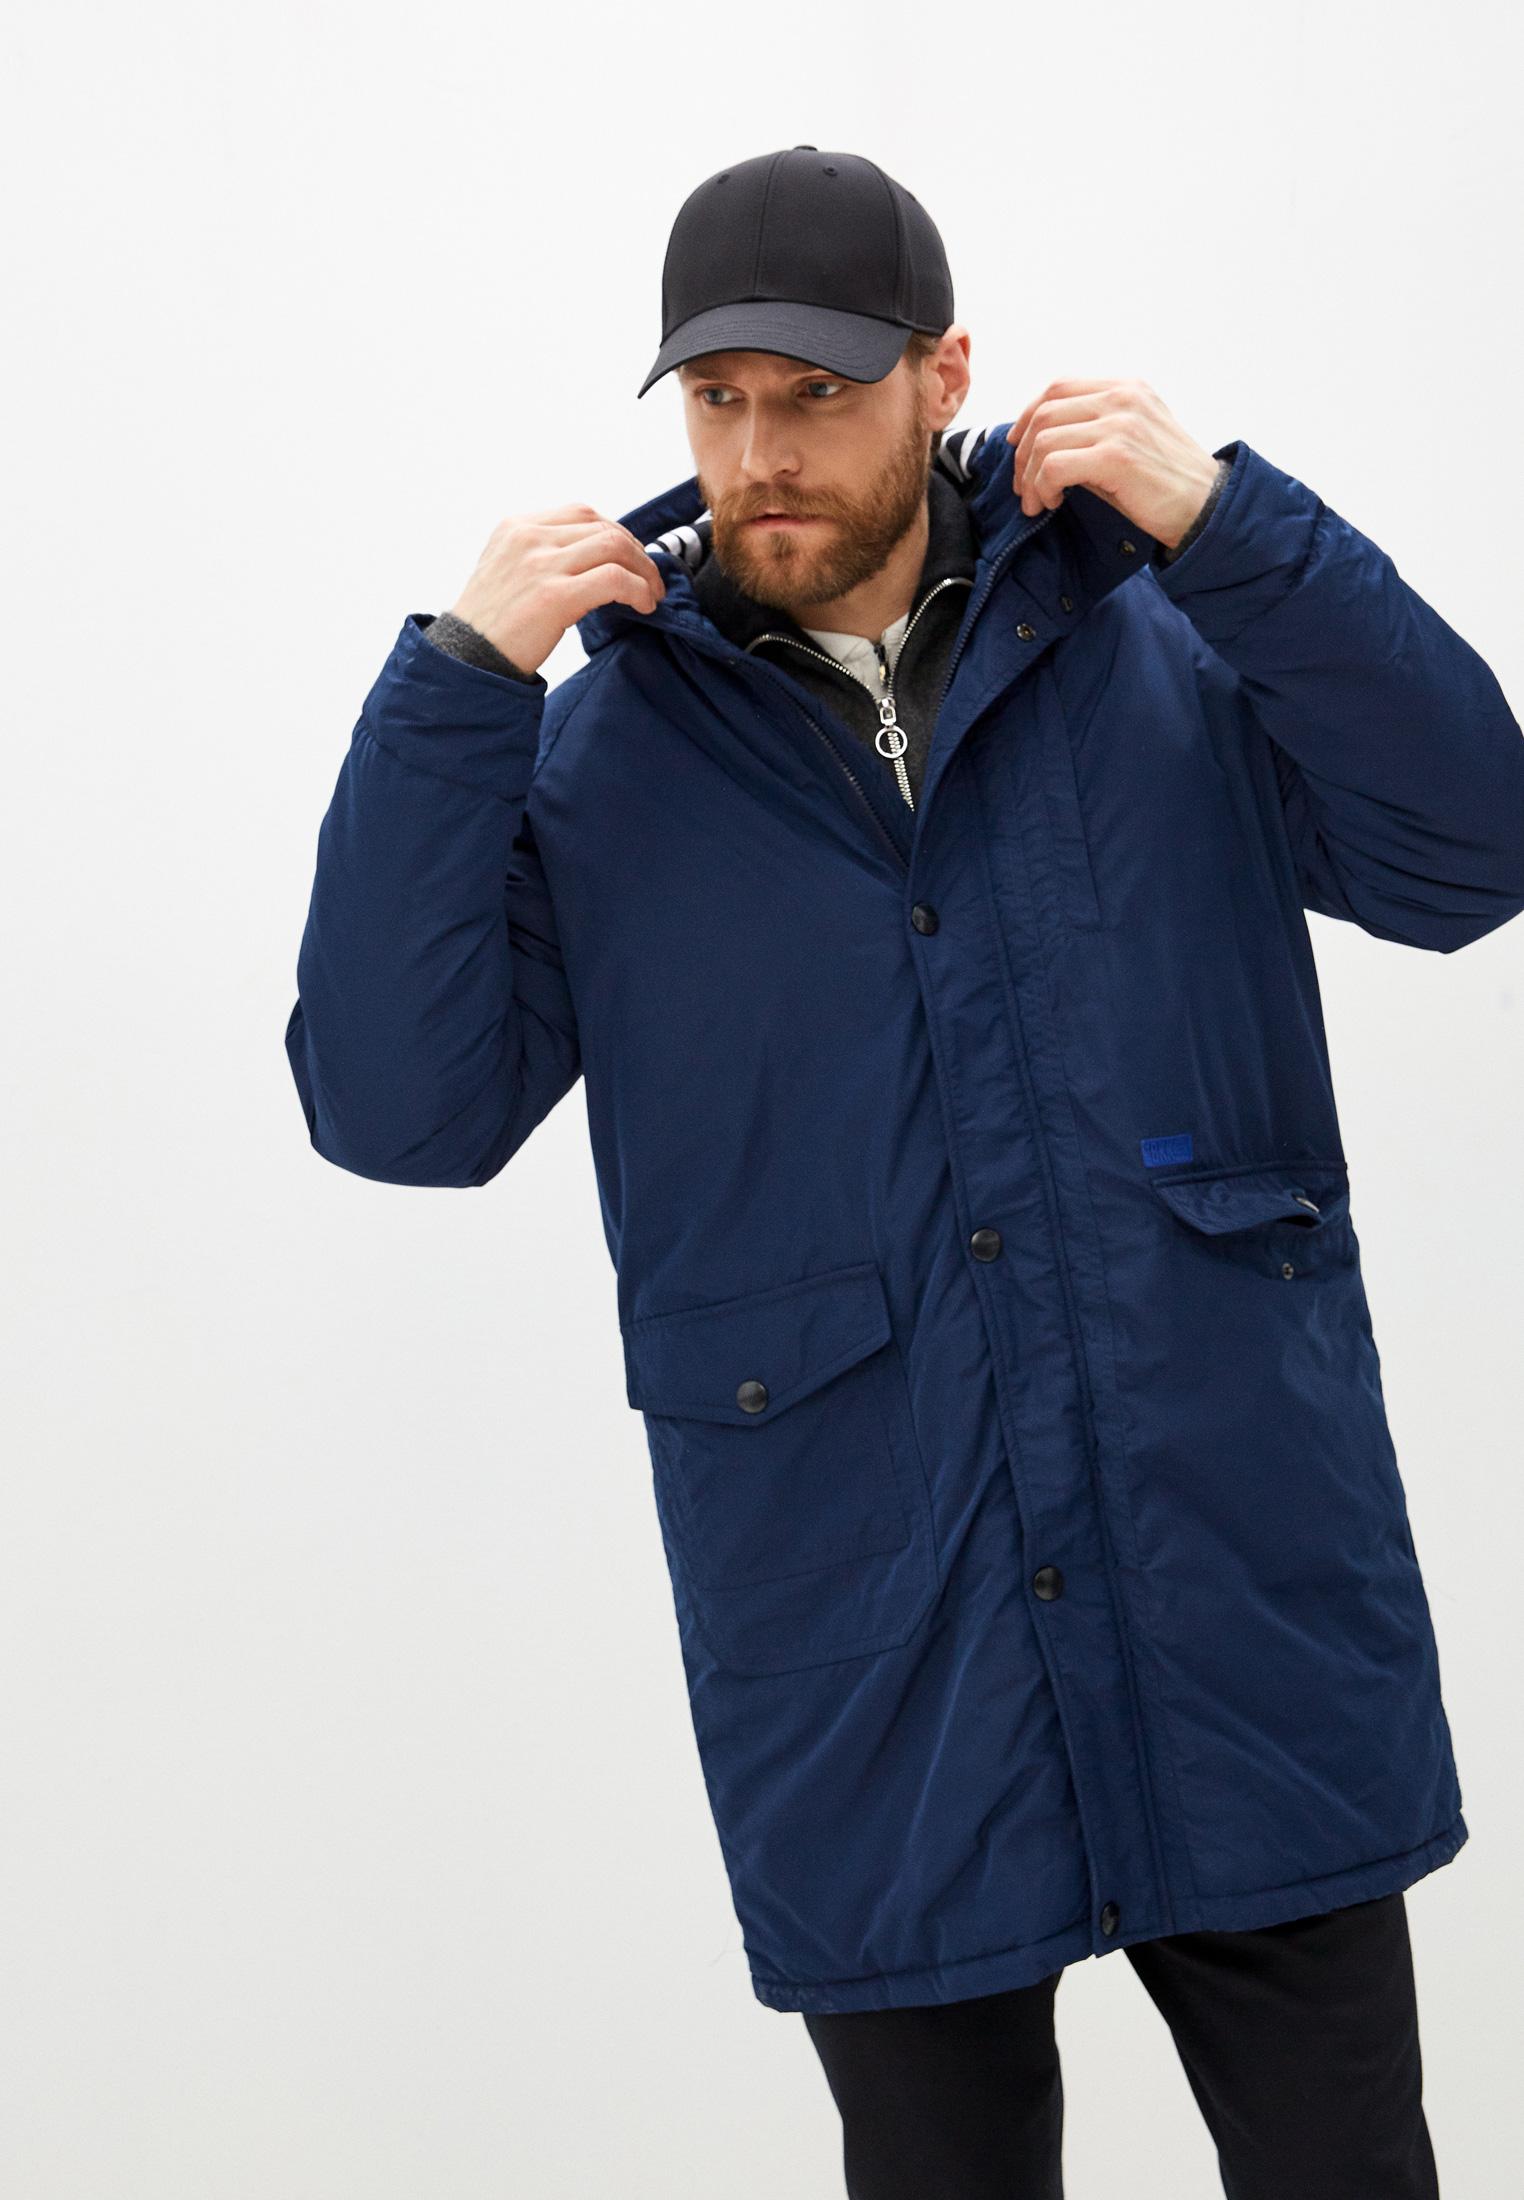 Мужская куртка Bikkembergs (Биккембергс) C J 032 00 T 9839